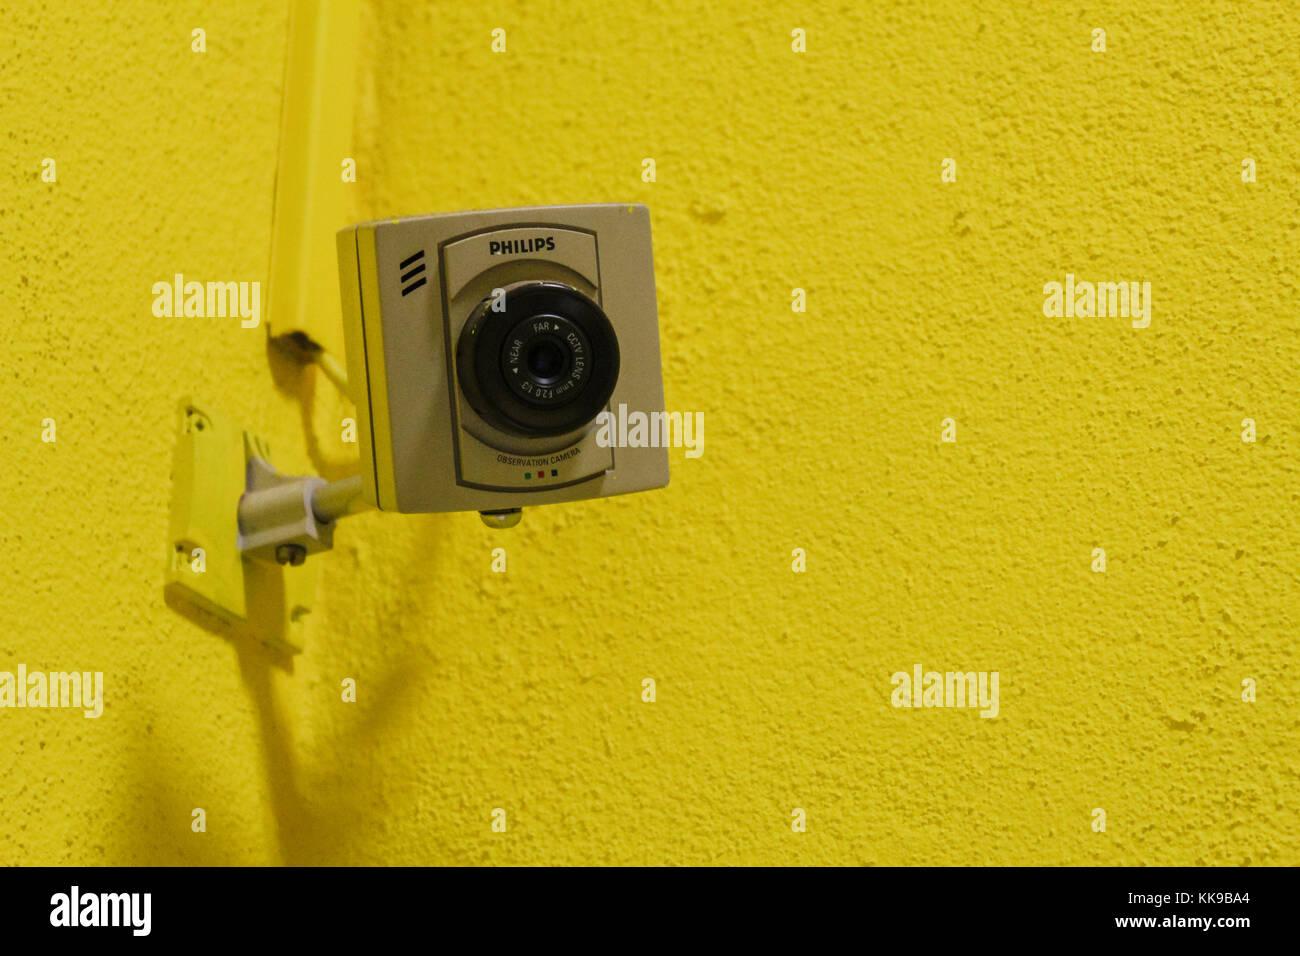 Surveillance - Stock Image